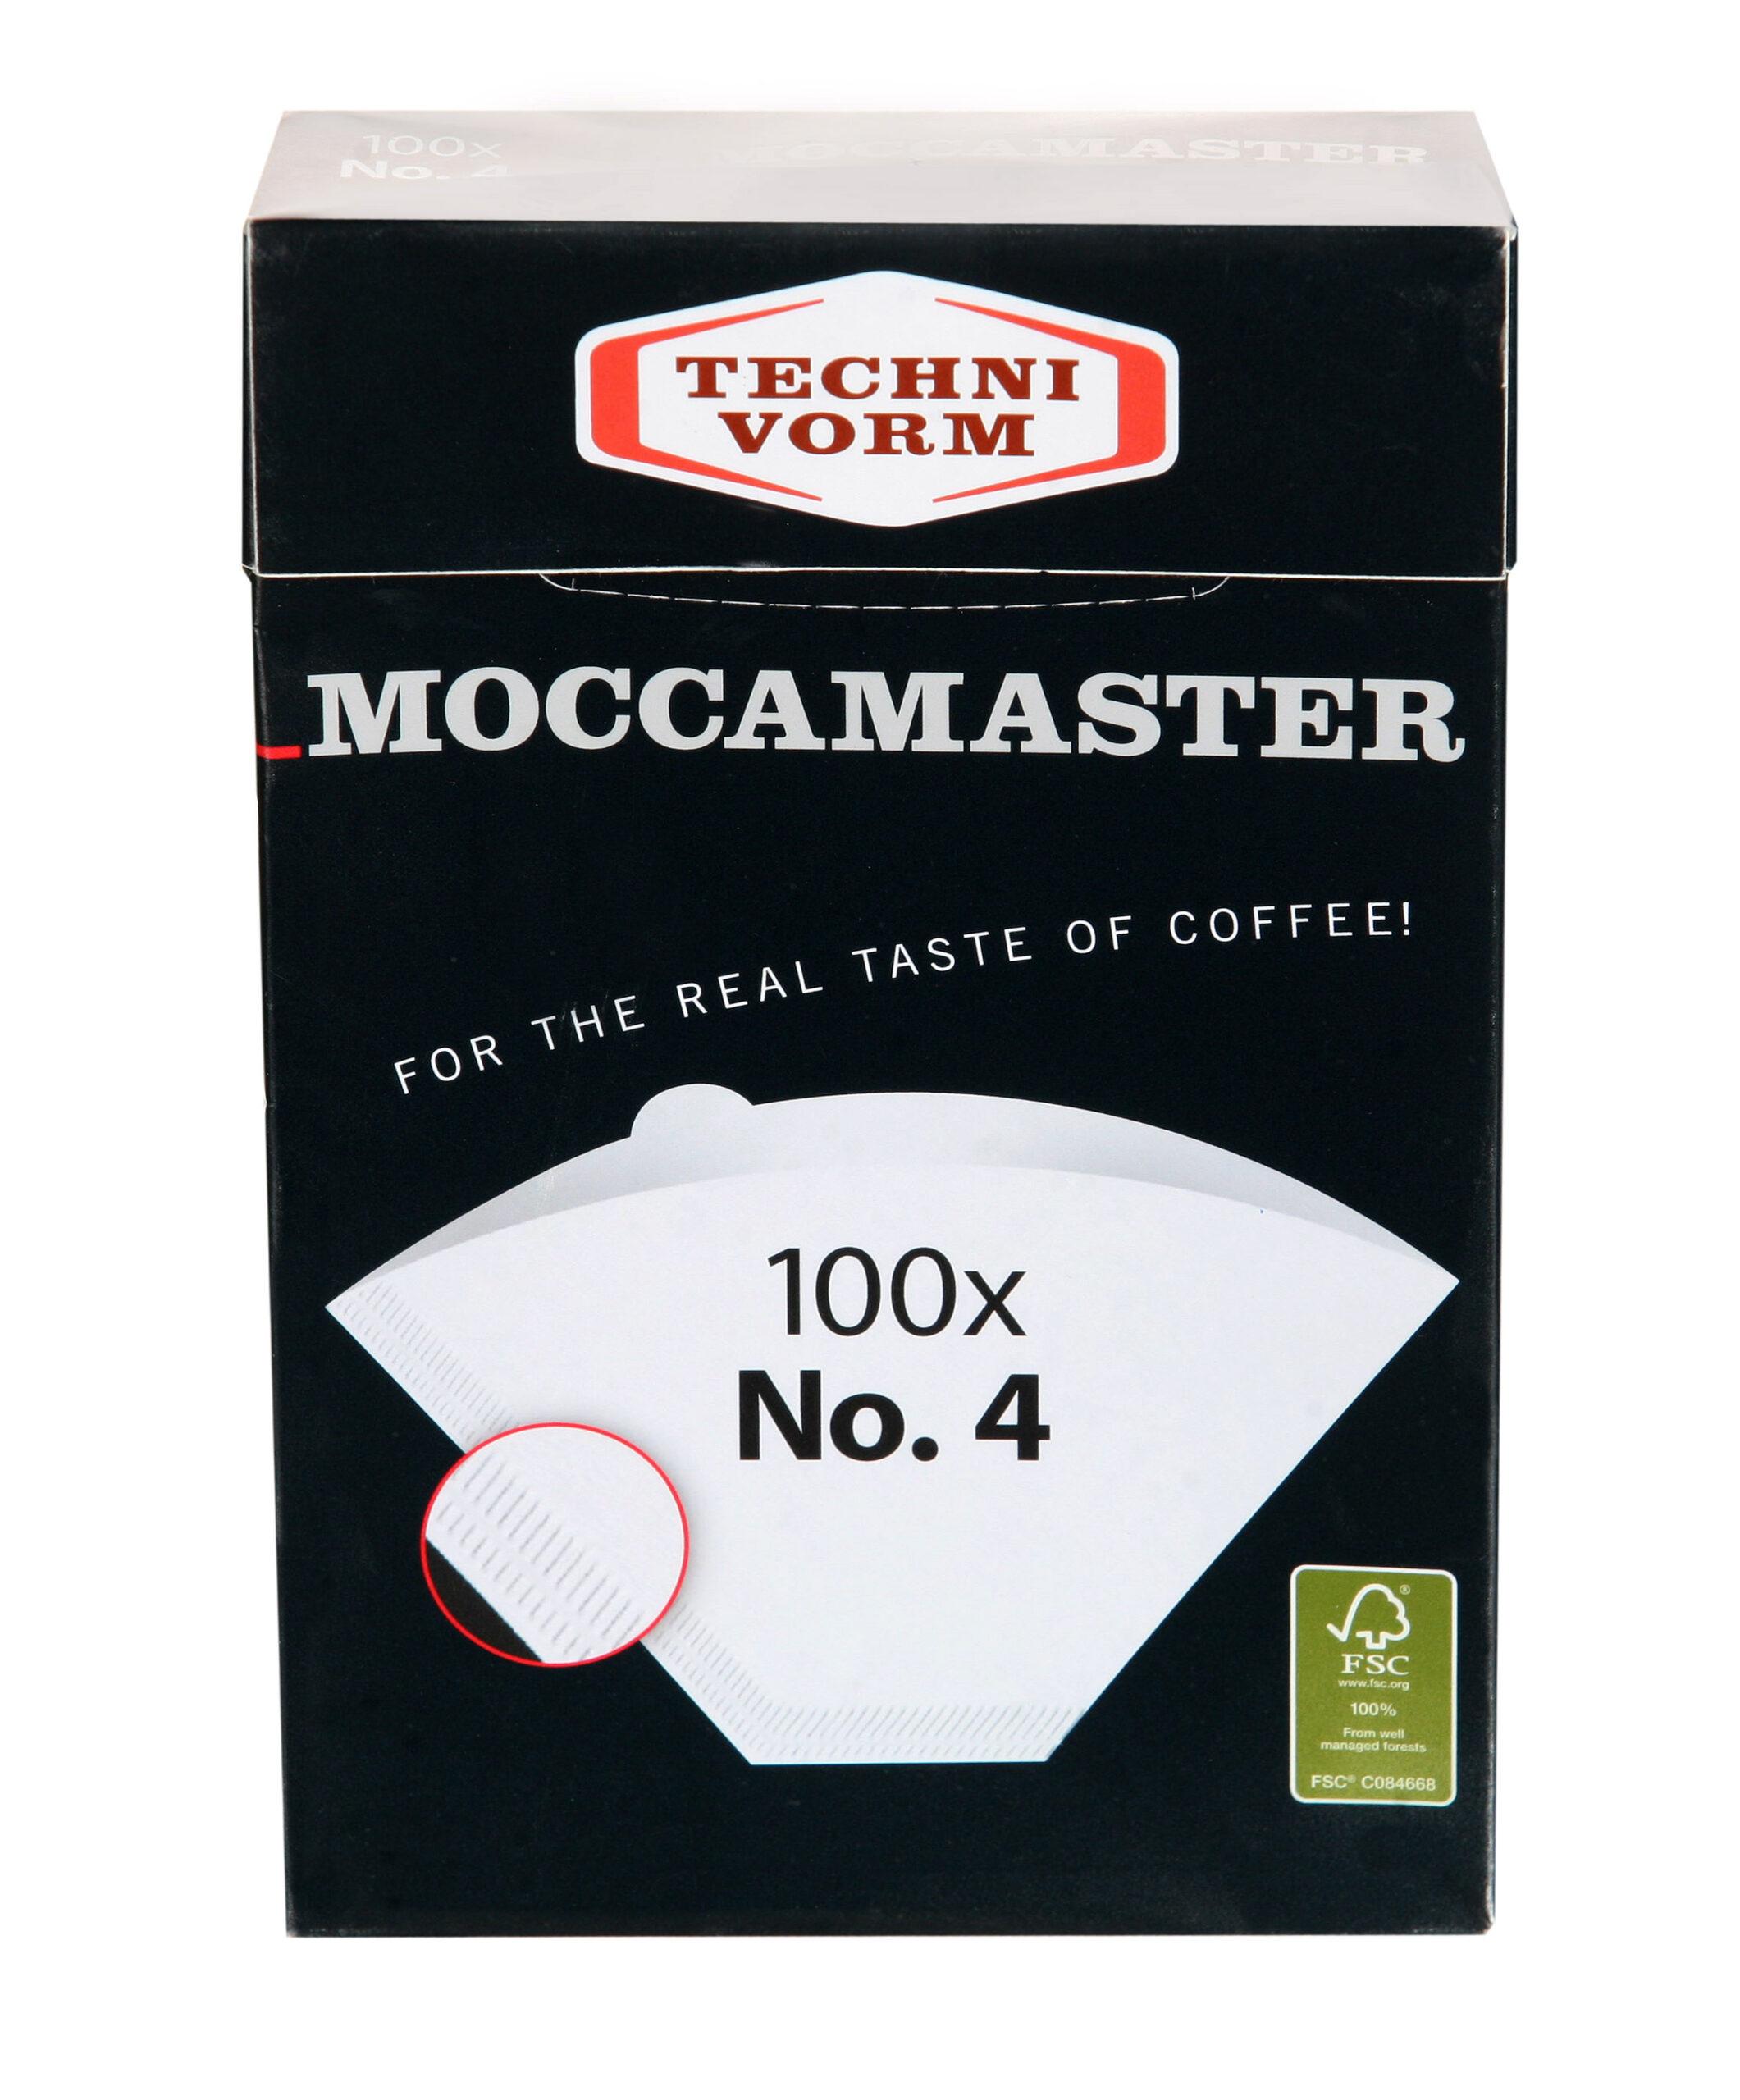 Moccamaster 100 Stück Filtertüten Nr.4 Kaffee Filter weiß ♥ 250g Kolumbien inkl